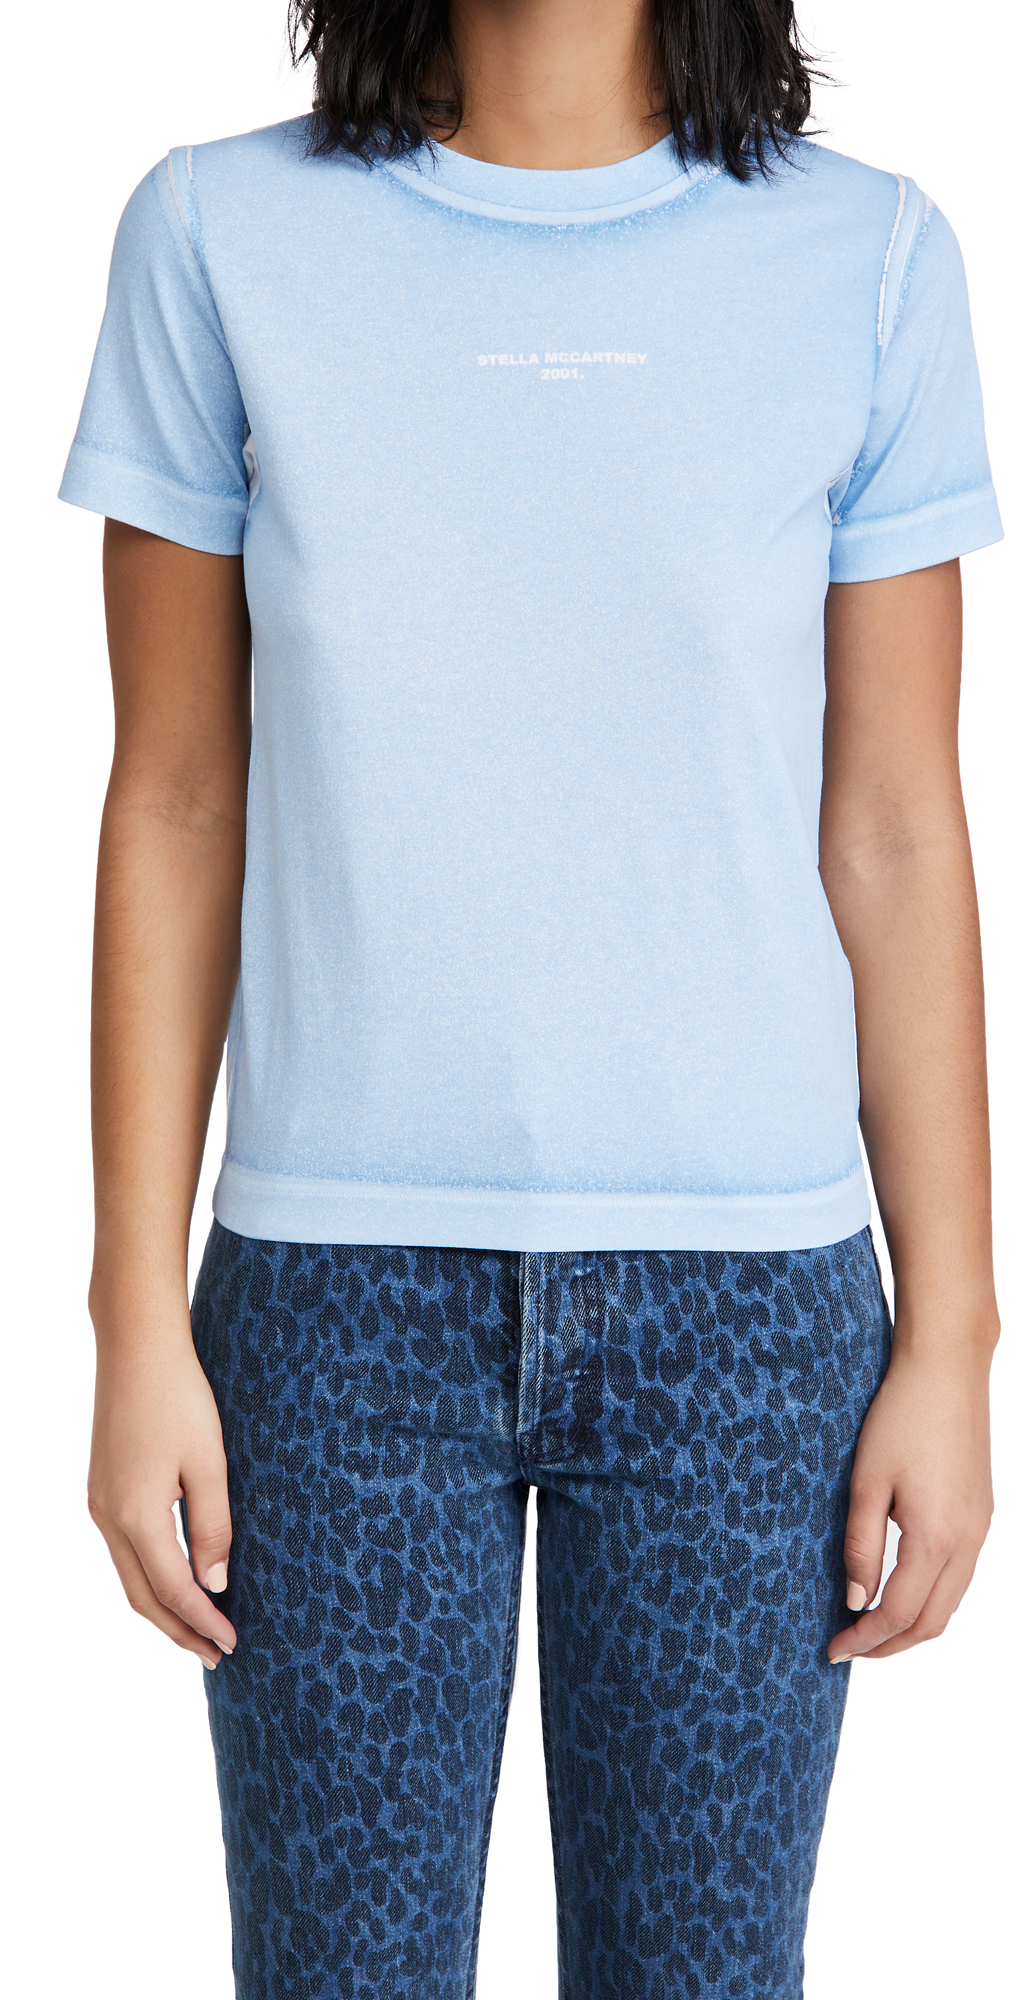 Stella McCartney T-Shirt Overprinted Color Shirt